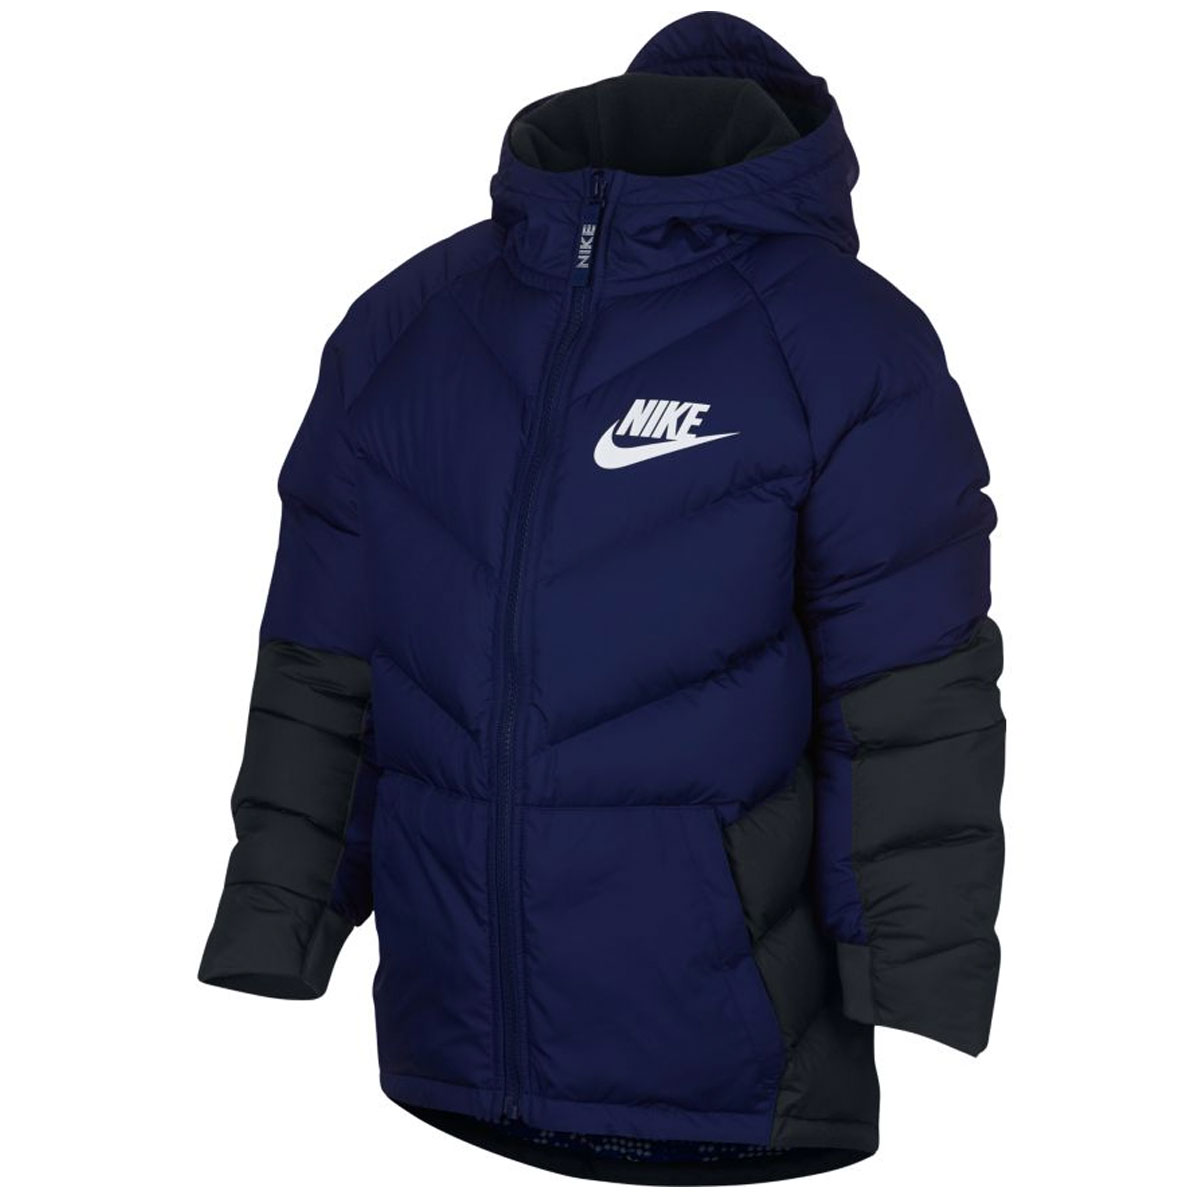 Winterjas Parka.Nike Down Filled Parka Winterjas Junior Blauw Online Kopen Bij